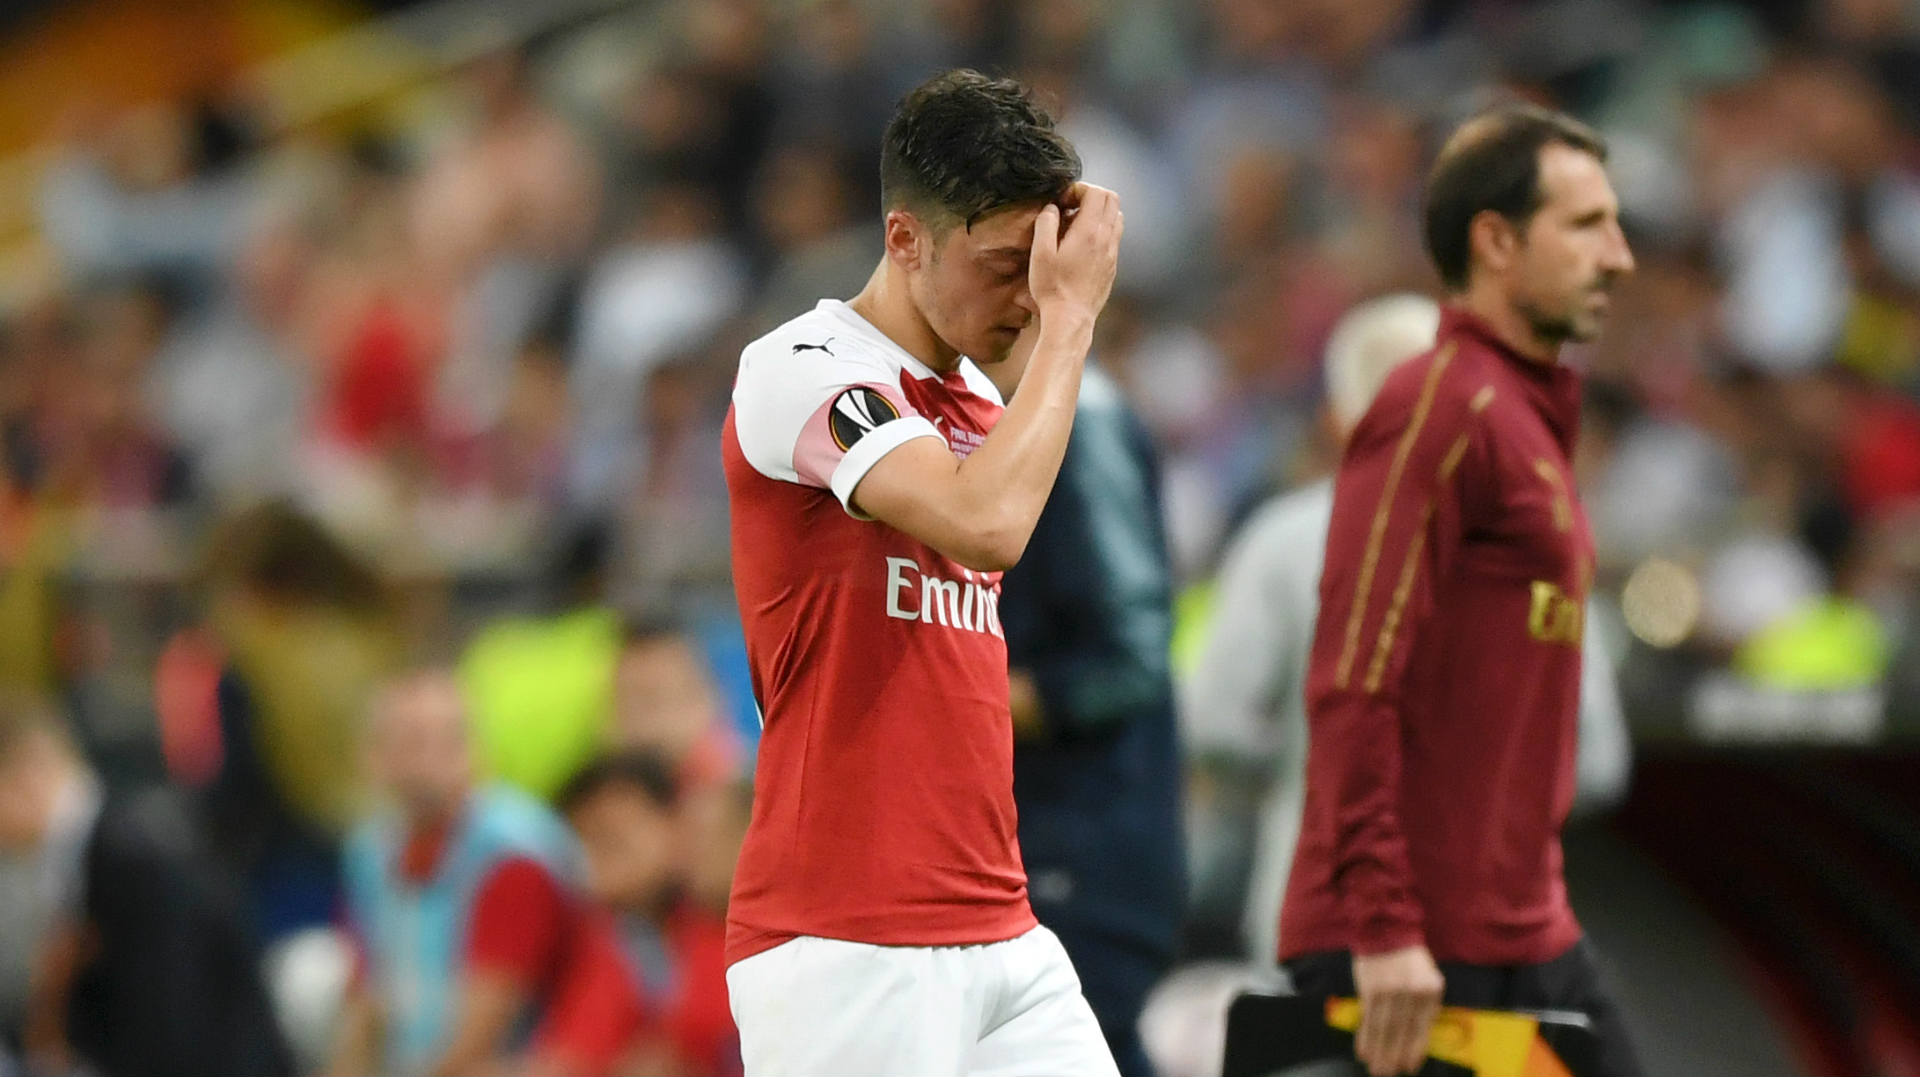 Arsenal - Özil et Kolasinac victimes d'un car-jacking à Londres